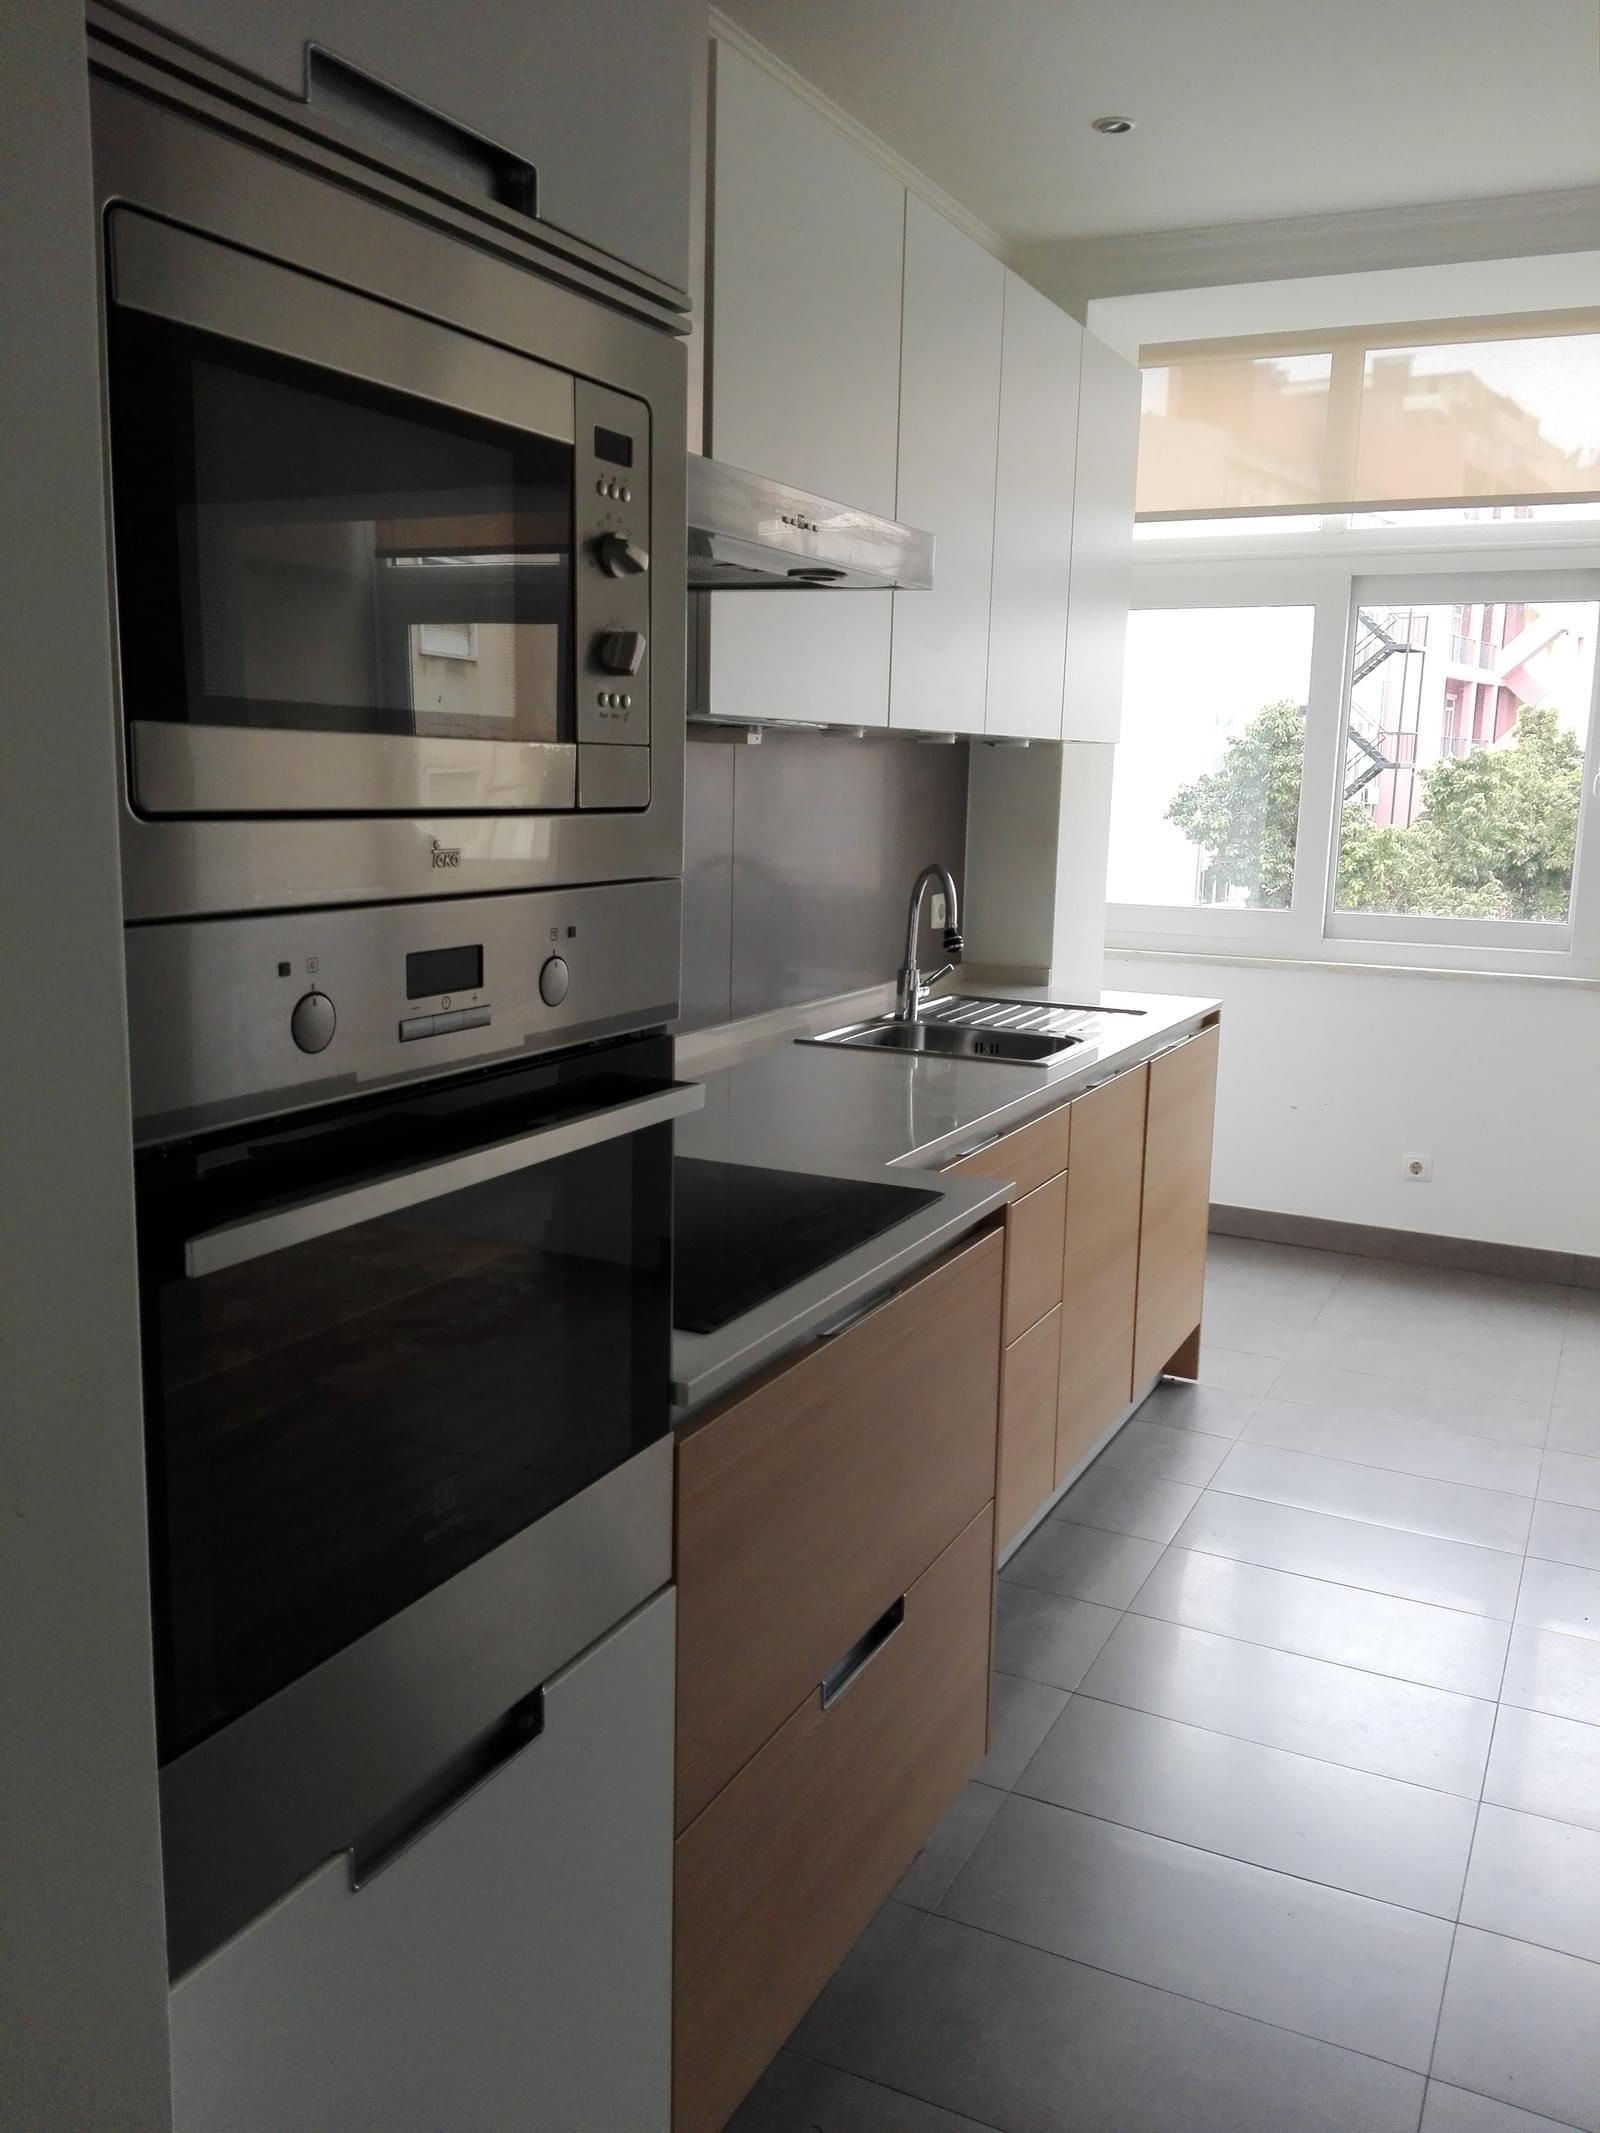 pf17056-apartamento-t4-1-lisboa-de9b9a3b-65a2-4cb1-87e8-a925ecd25b4c